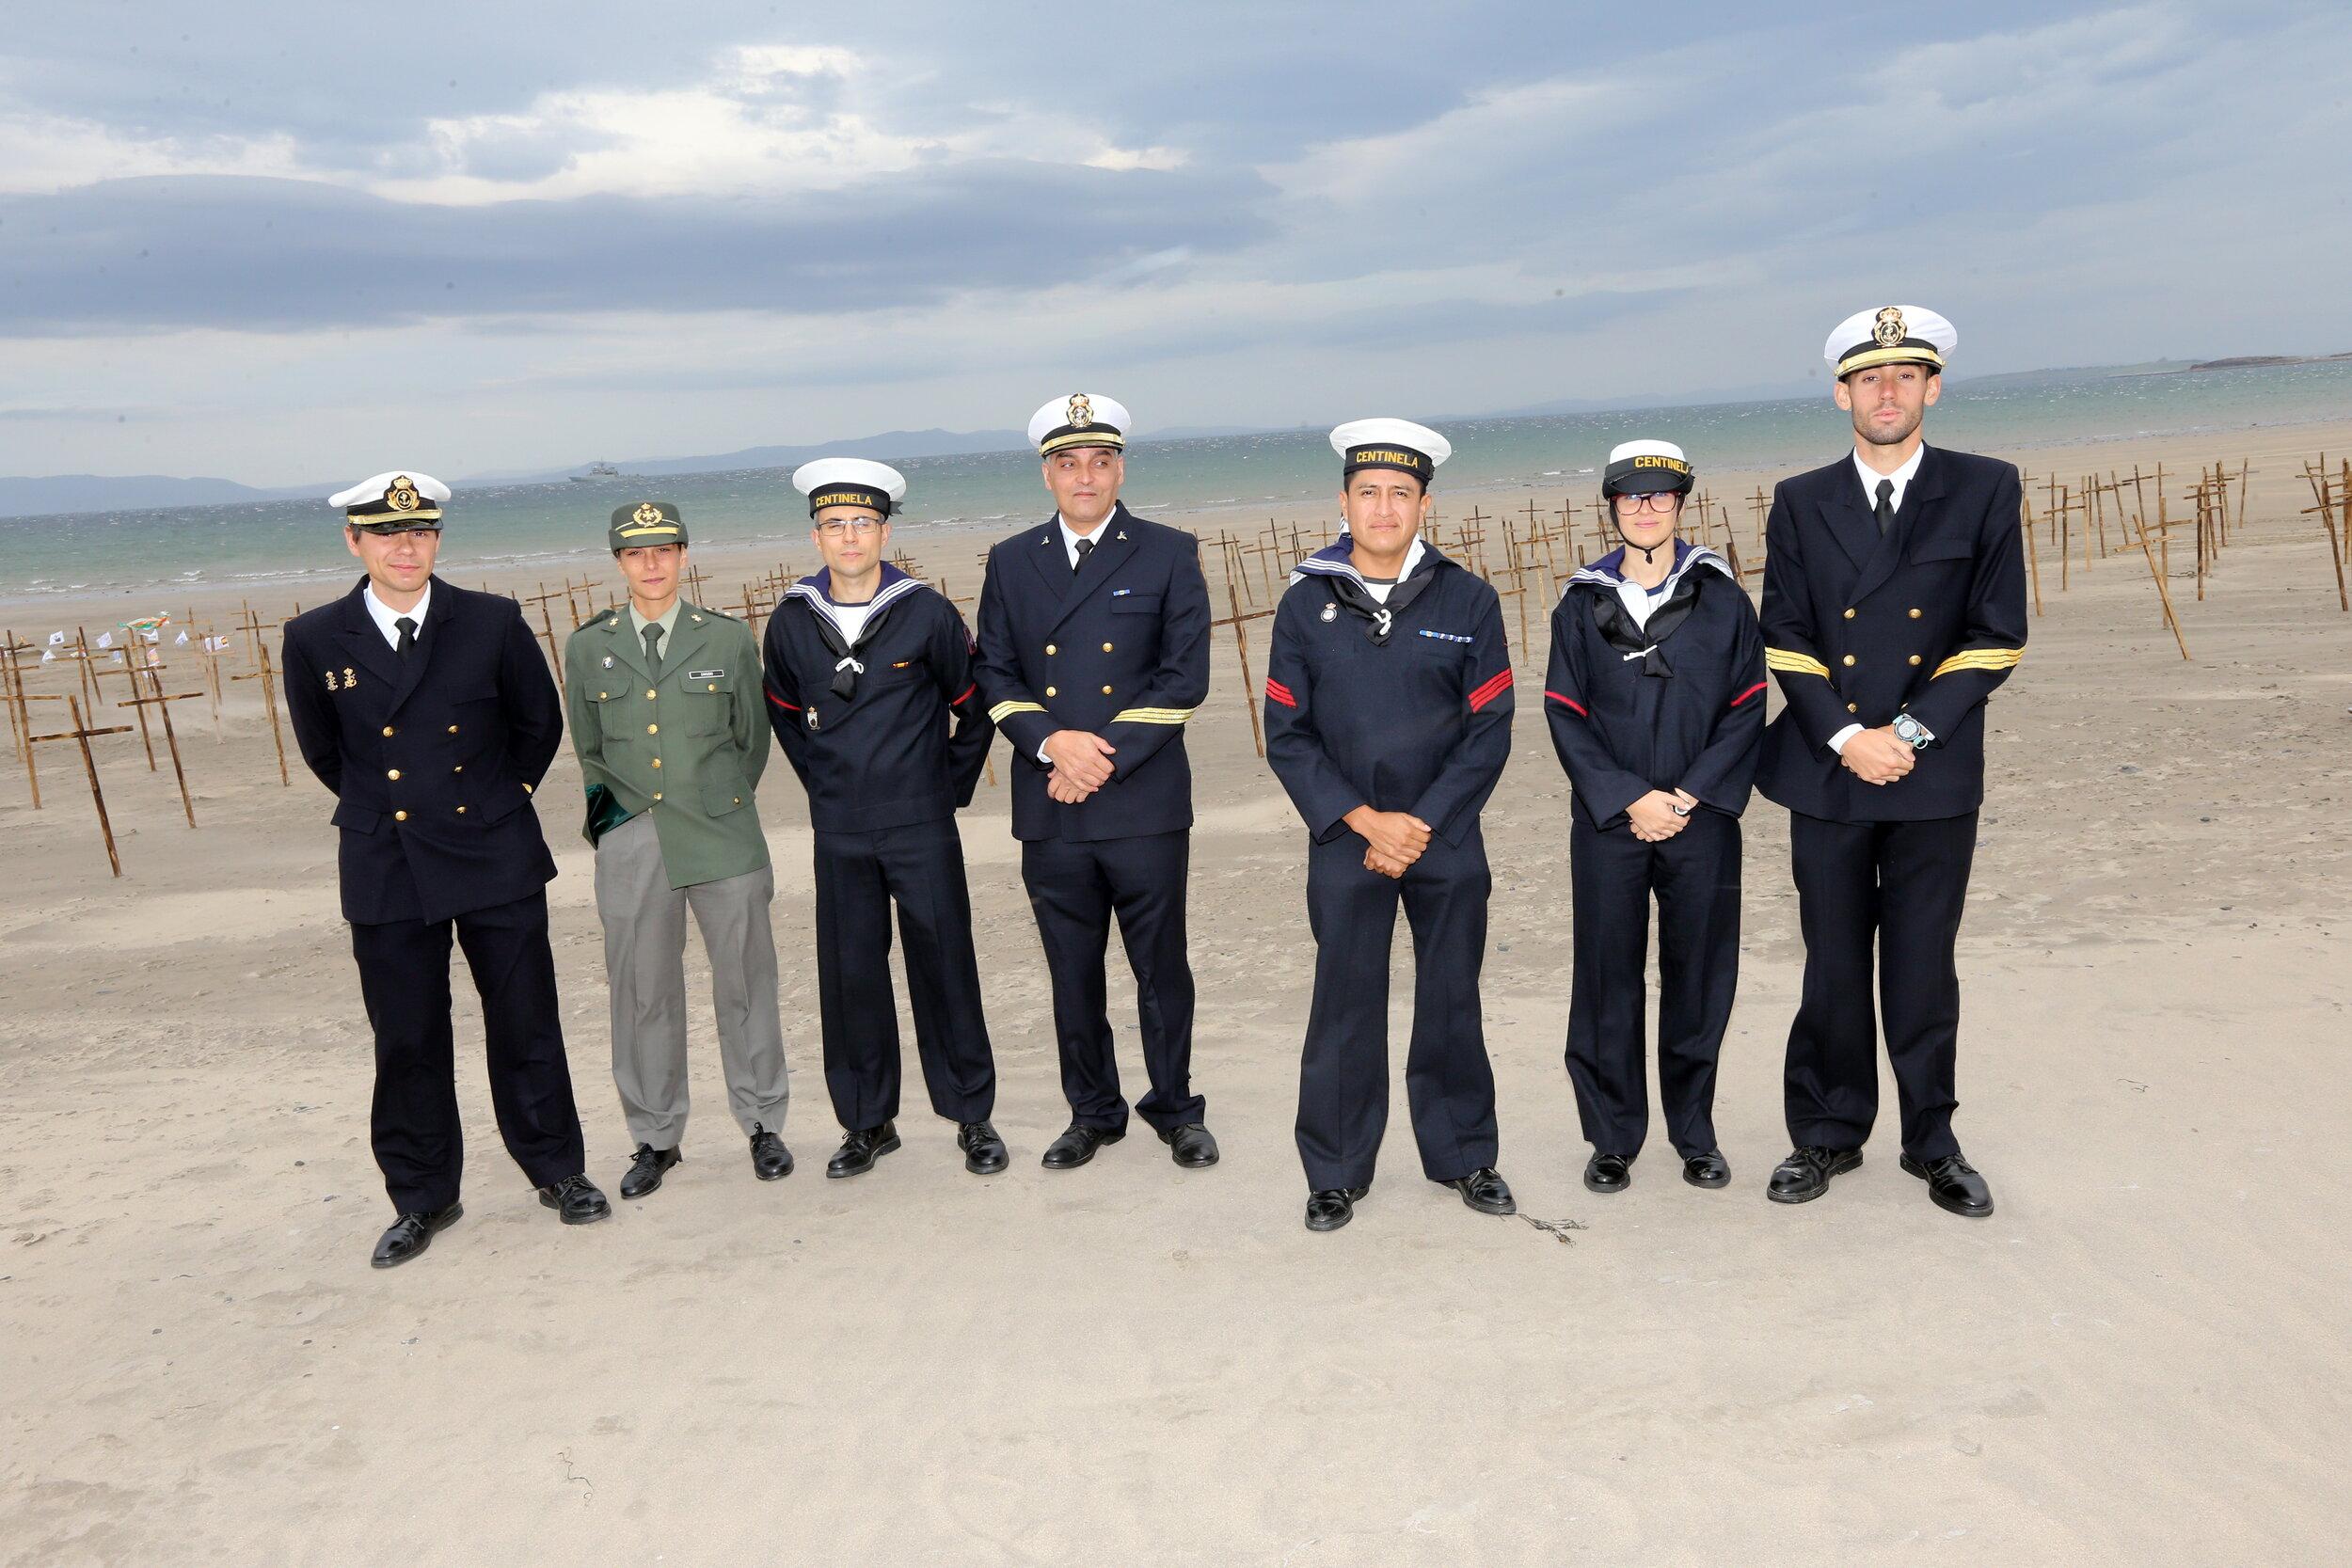 Spanish Naval personnel on Streedagh Beach - photo Charlie Brady